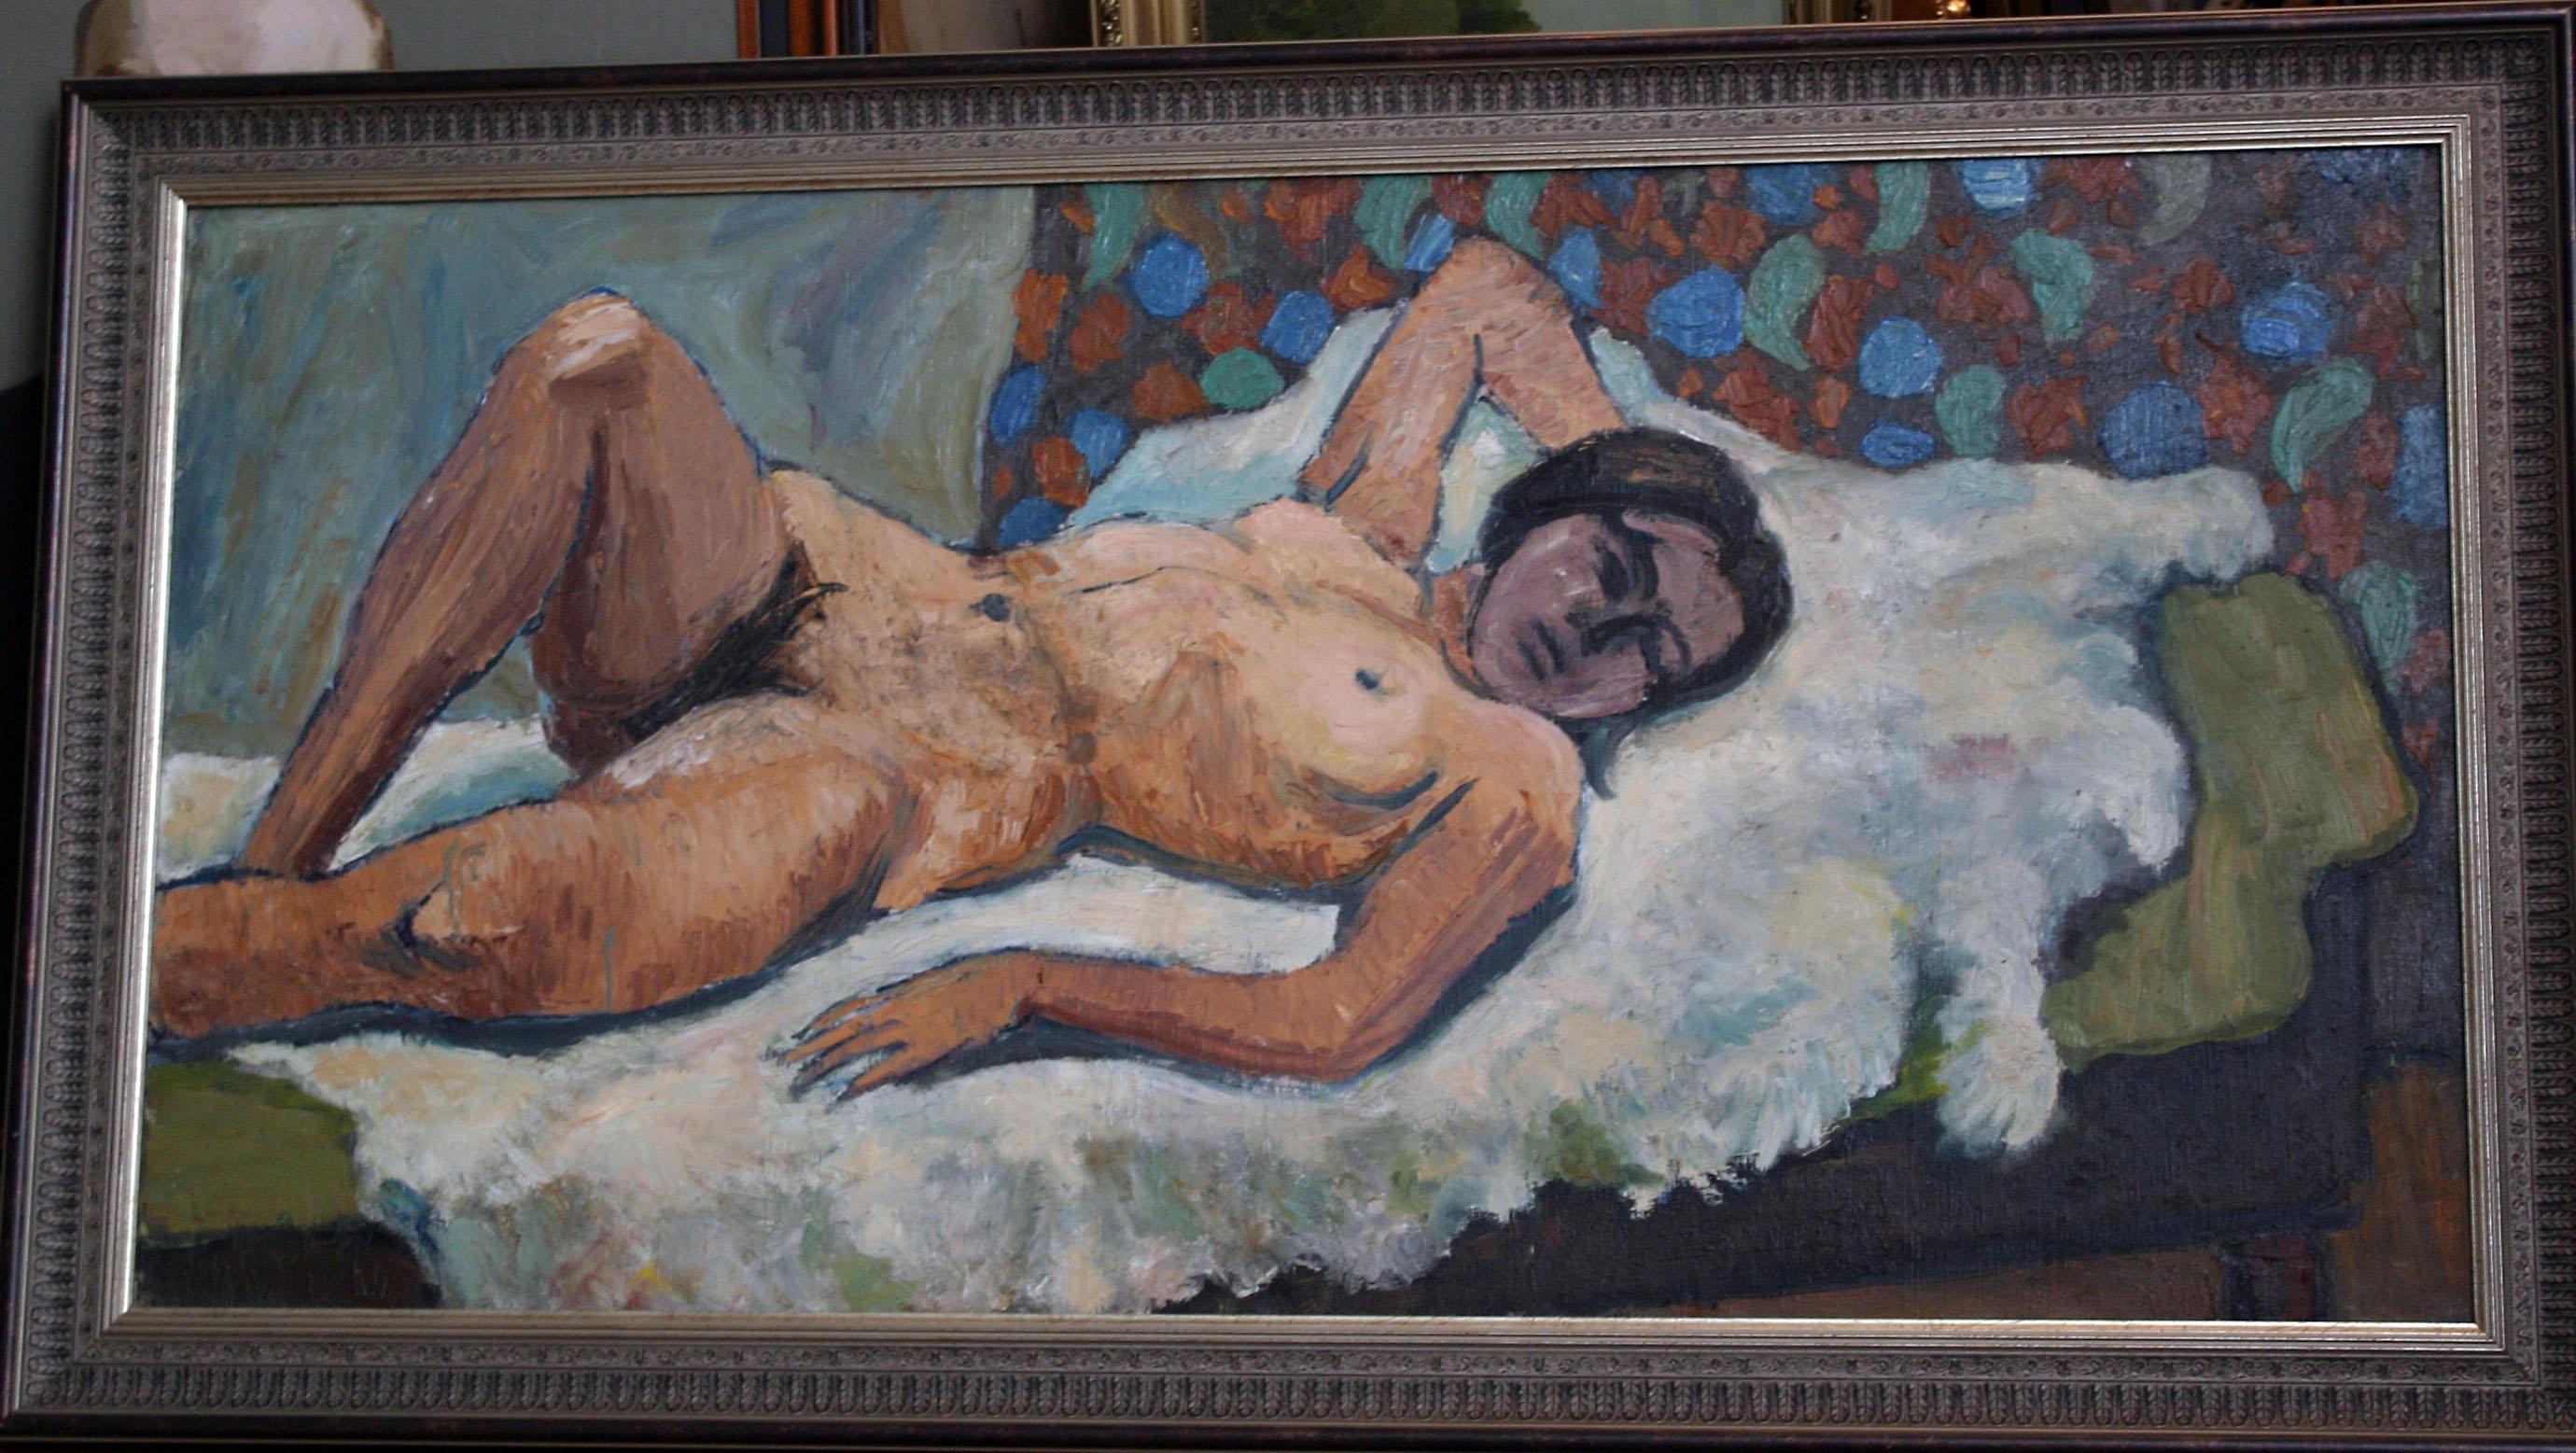 живопись начала 20 века: